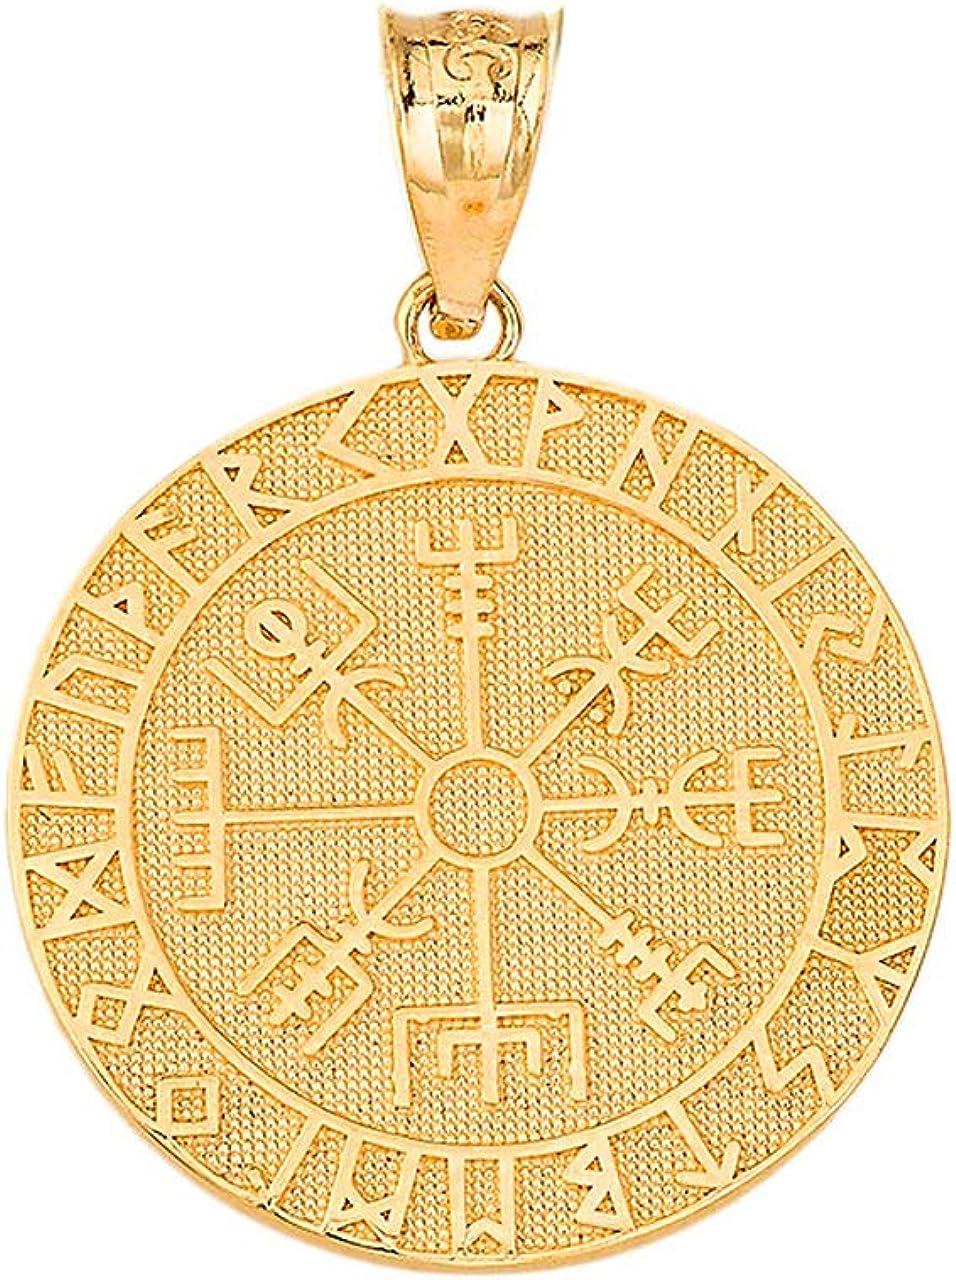 Certified 10k Gold Viking Odin Symbol Rune Amulet Pantgram Vegvisir Compass Pendant